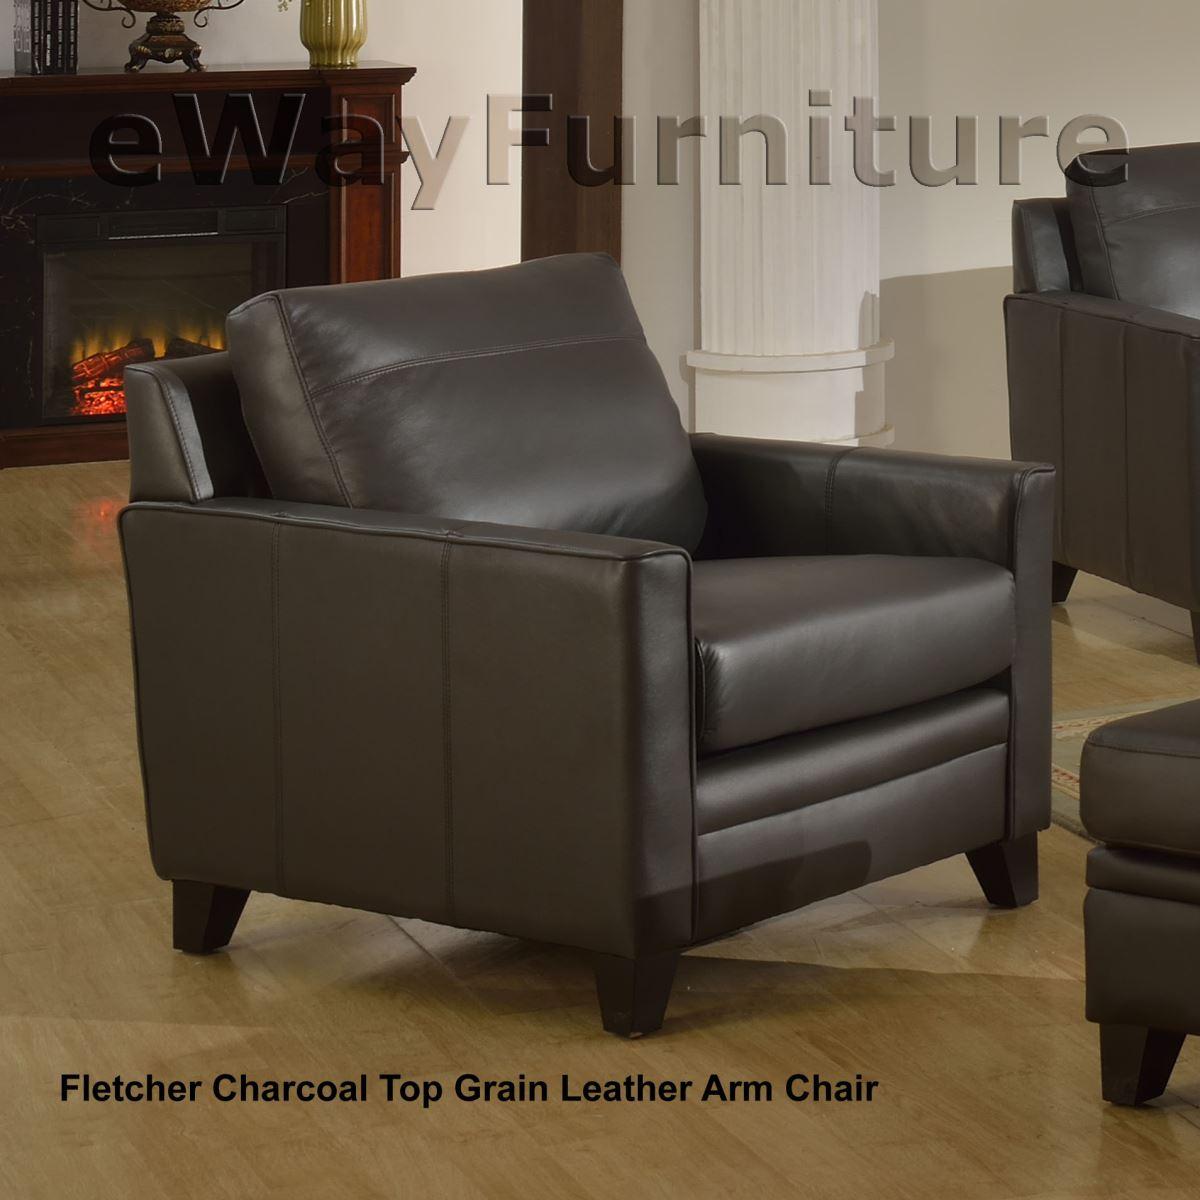 Fletcher Charcoal Top Grain Leather Loveseat